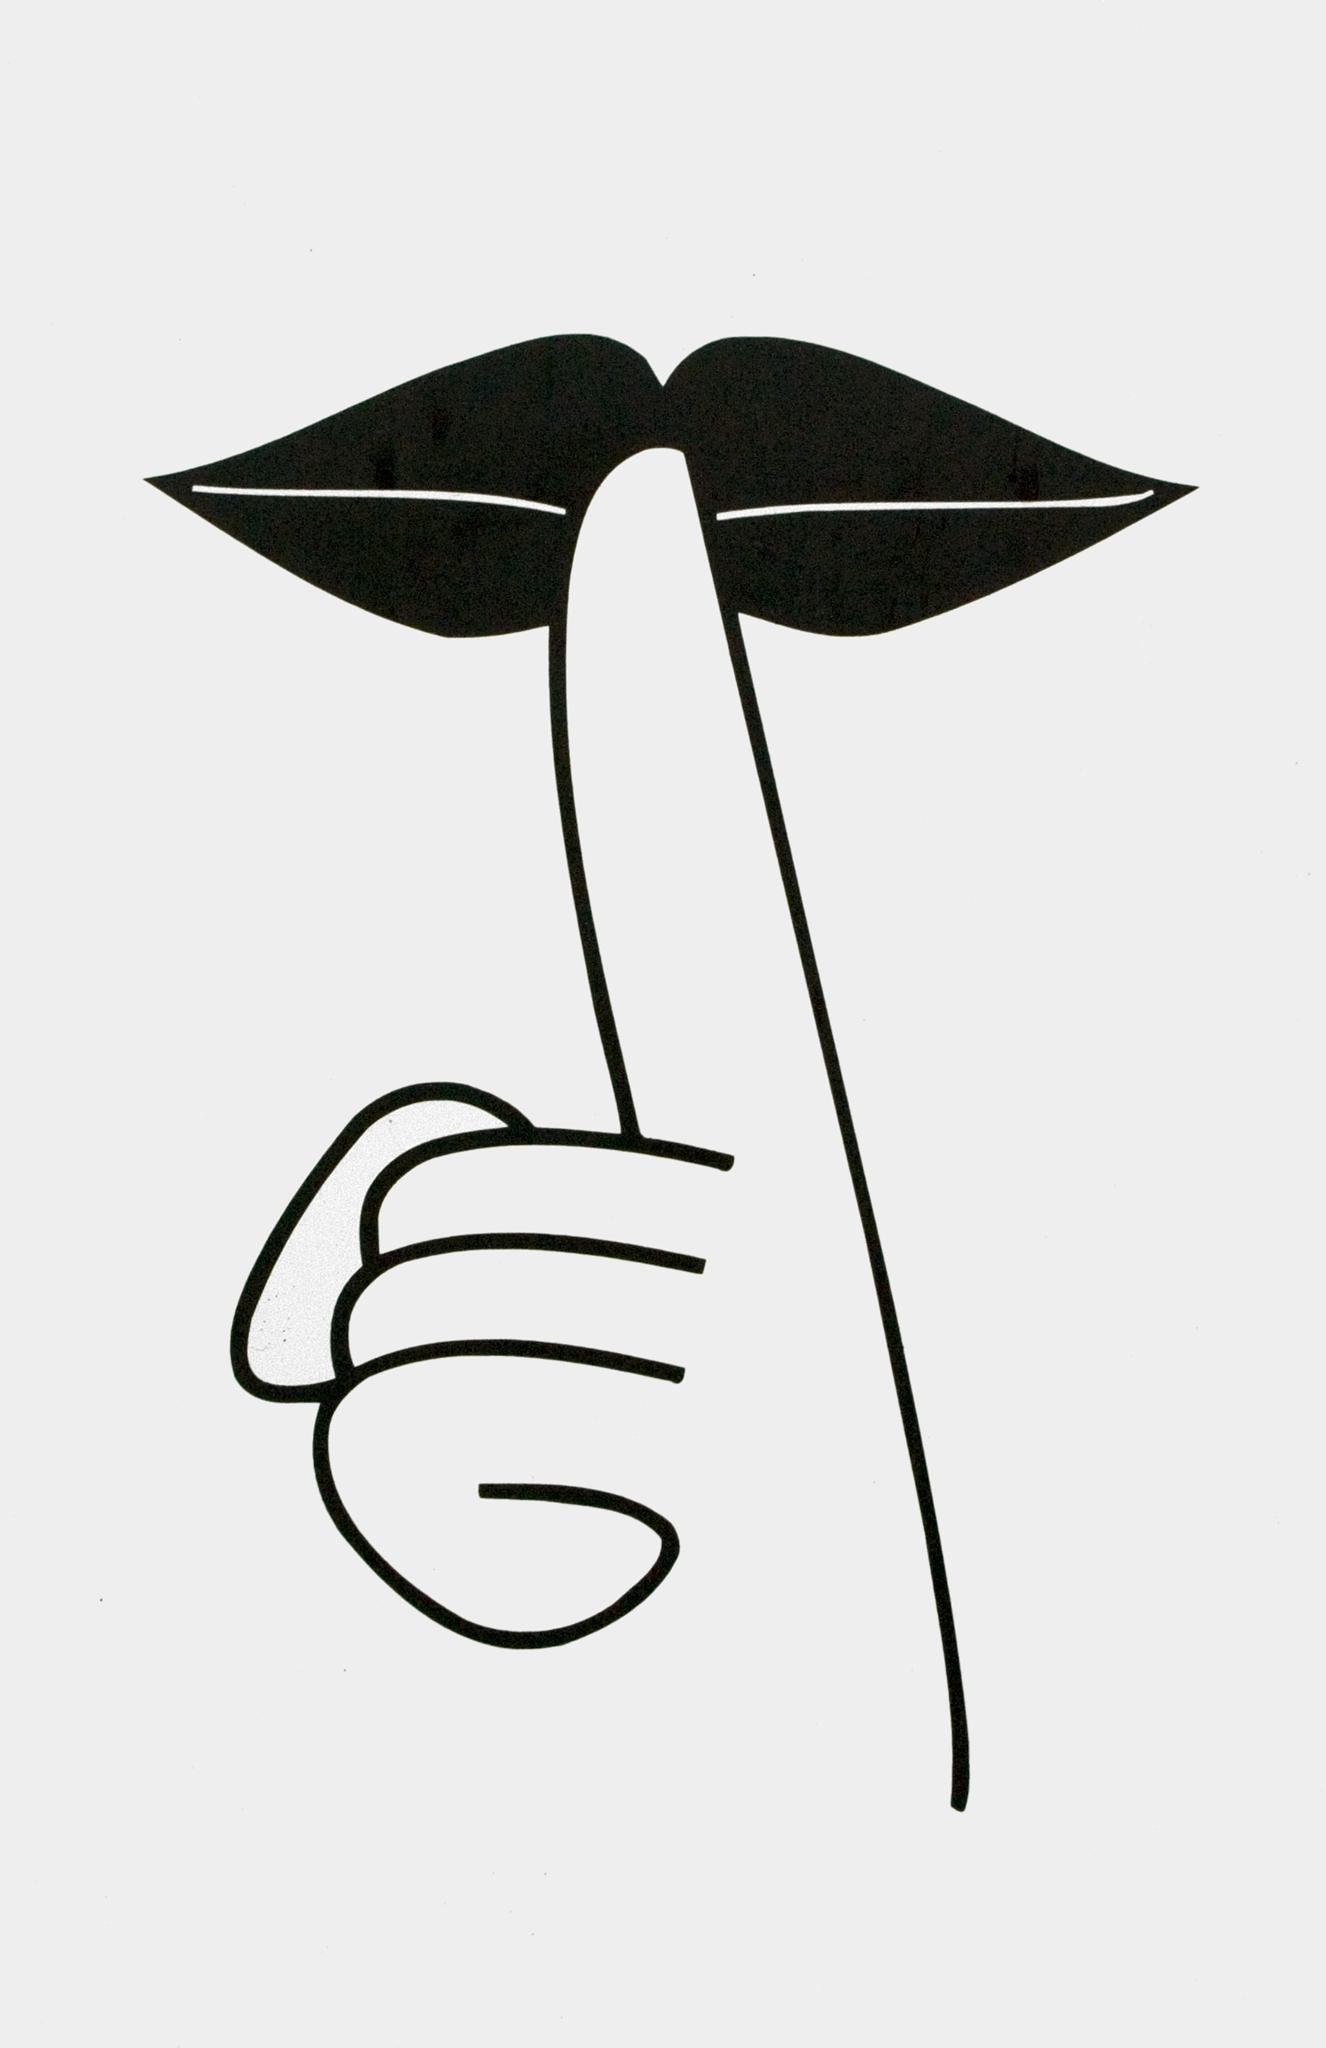 Shh.png